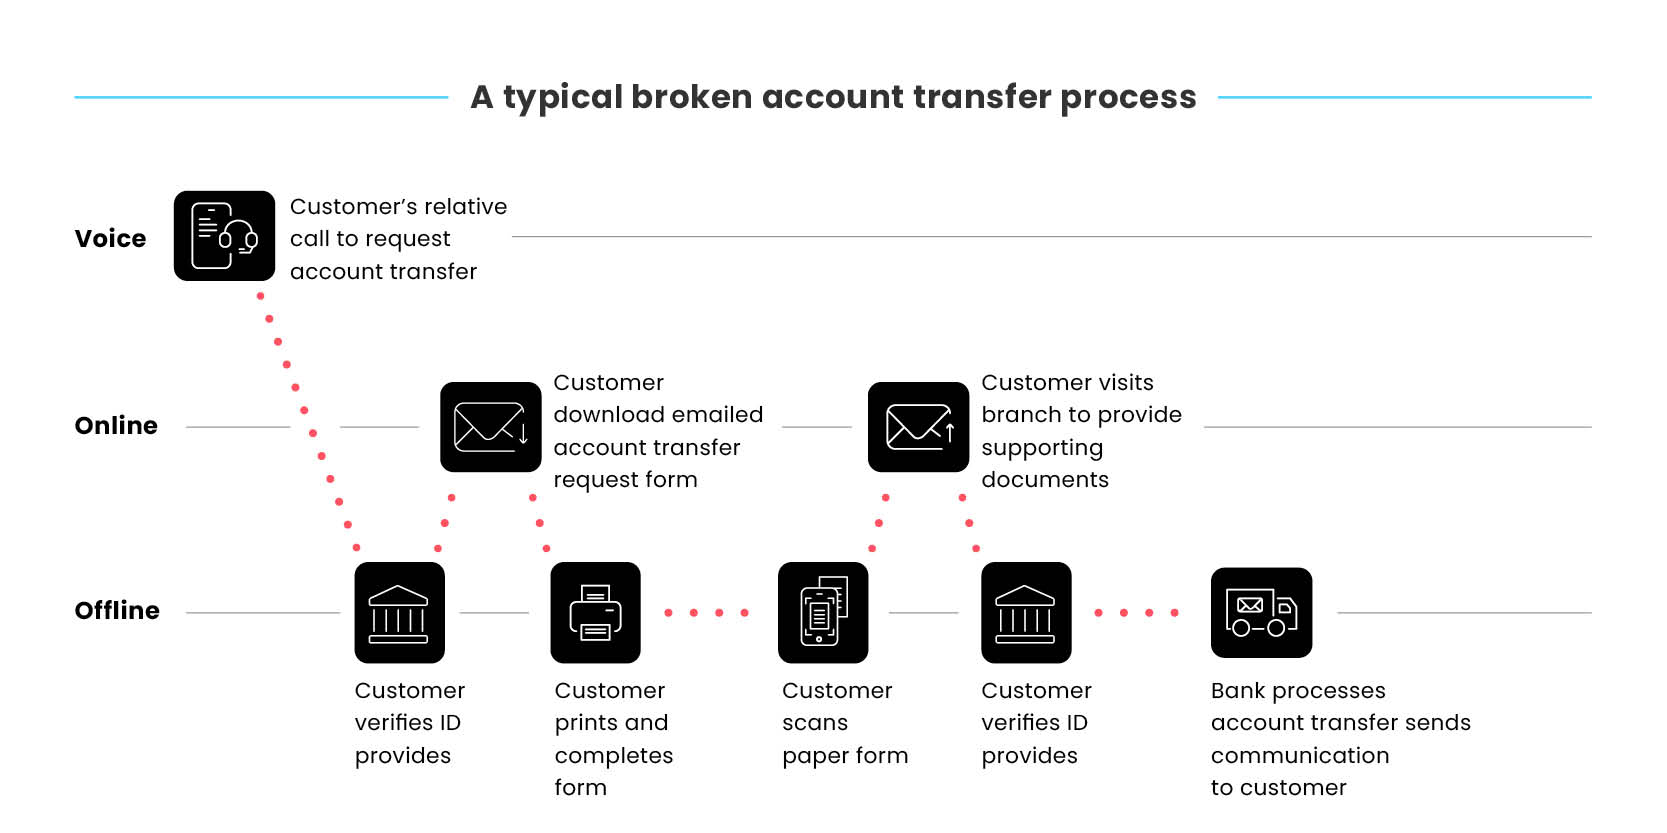 broken-journies-blog-images-bankning-A typical broken account transfer process